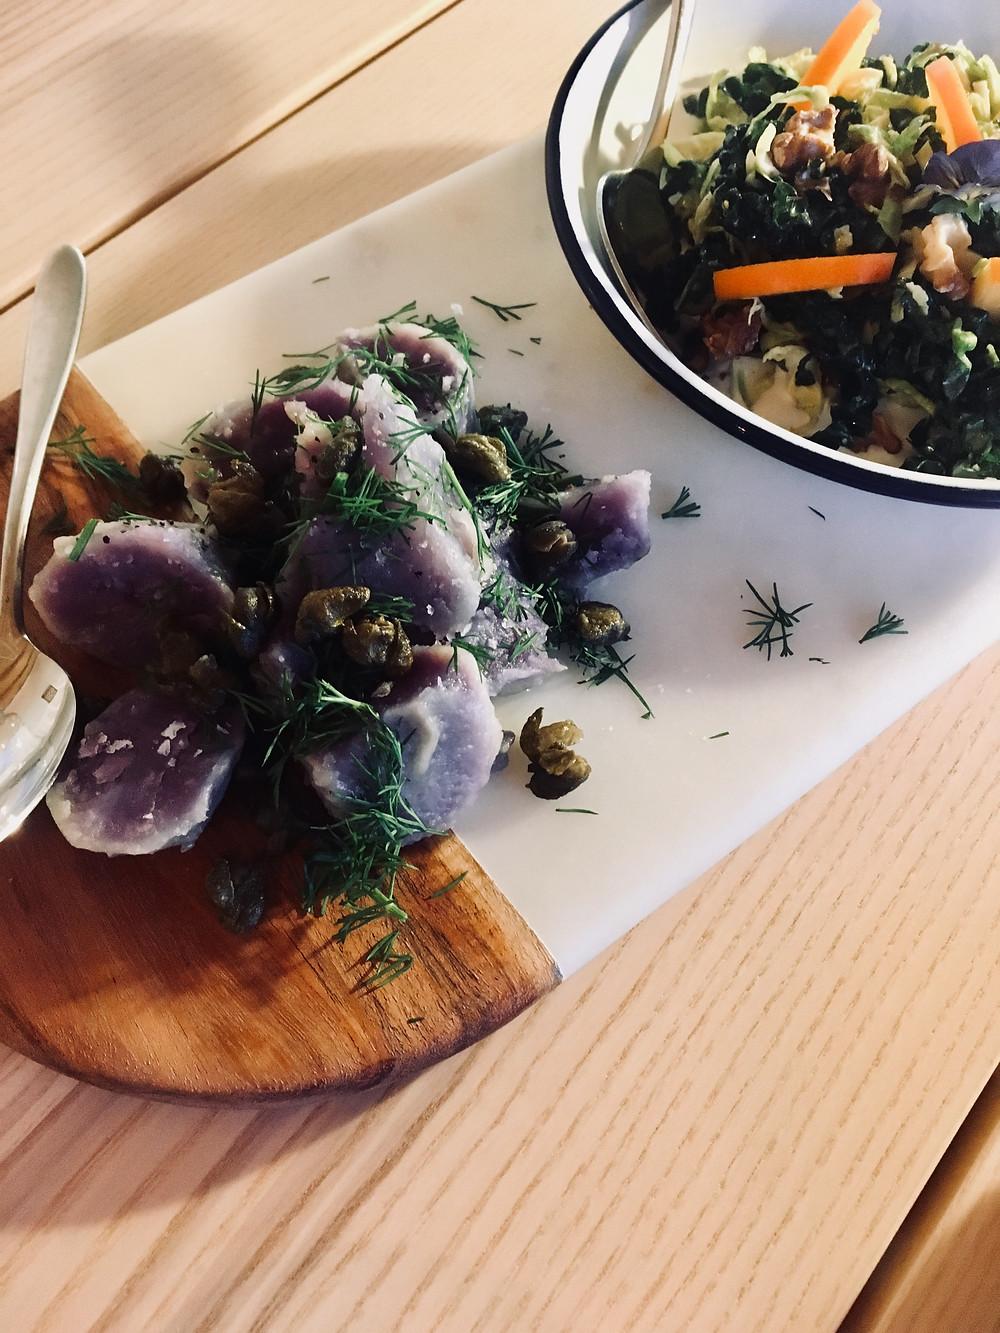 Purple Potatoes and Winter Salad